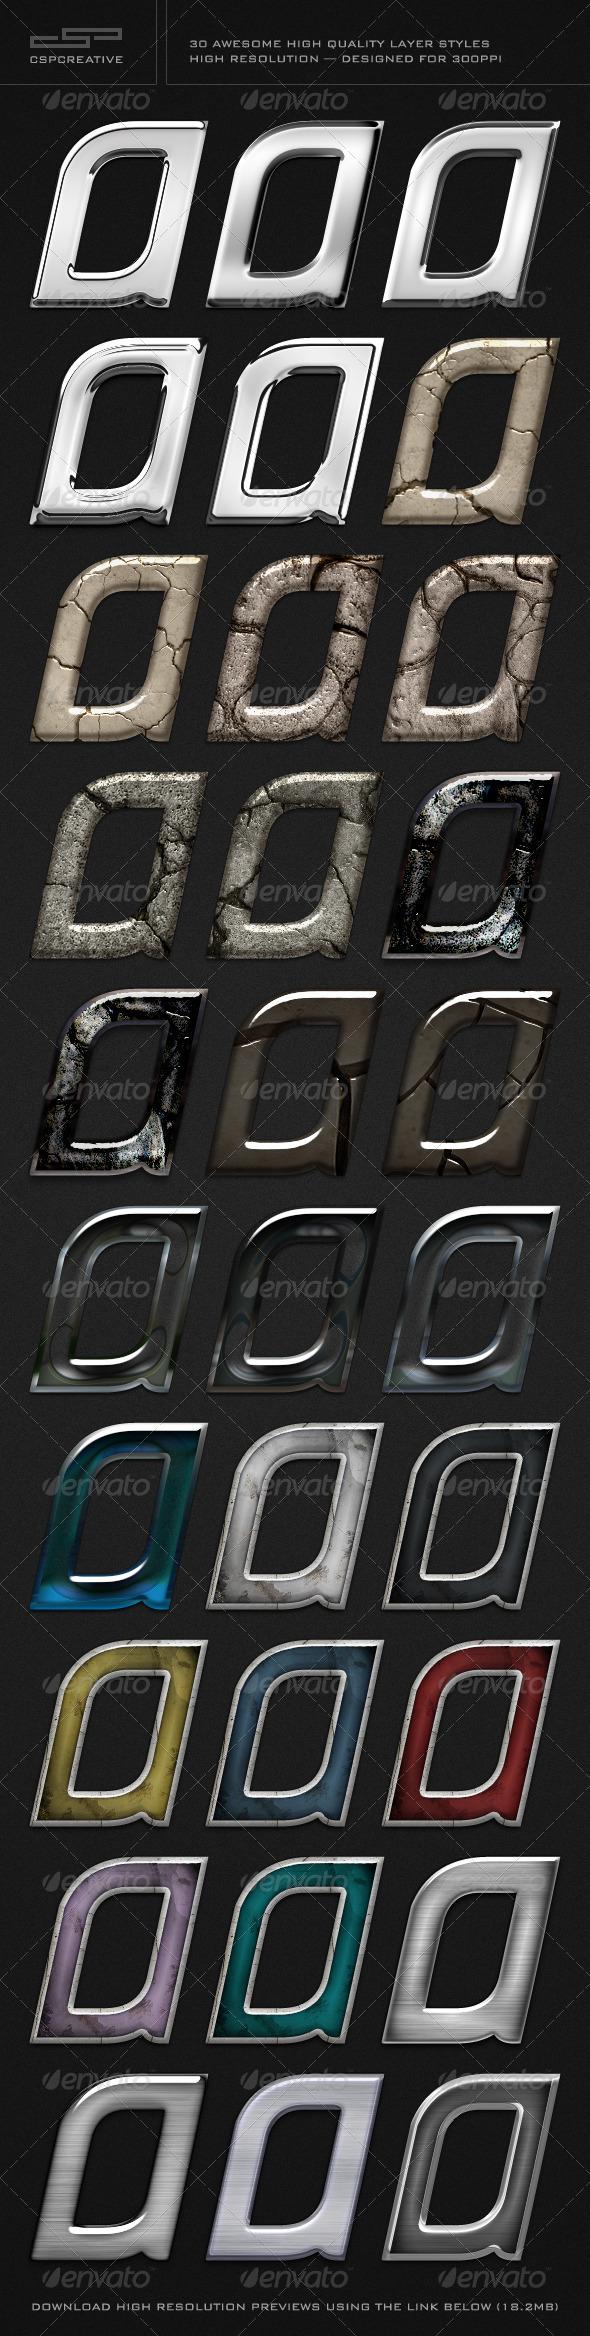 GraphicRiver CSP Creative Styles Bundle 1 676396